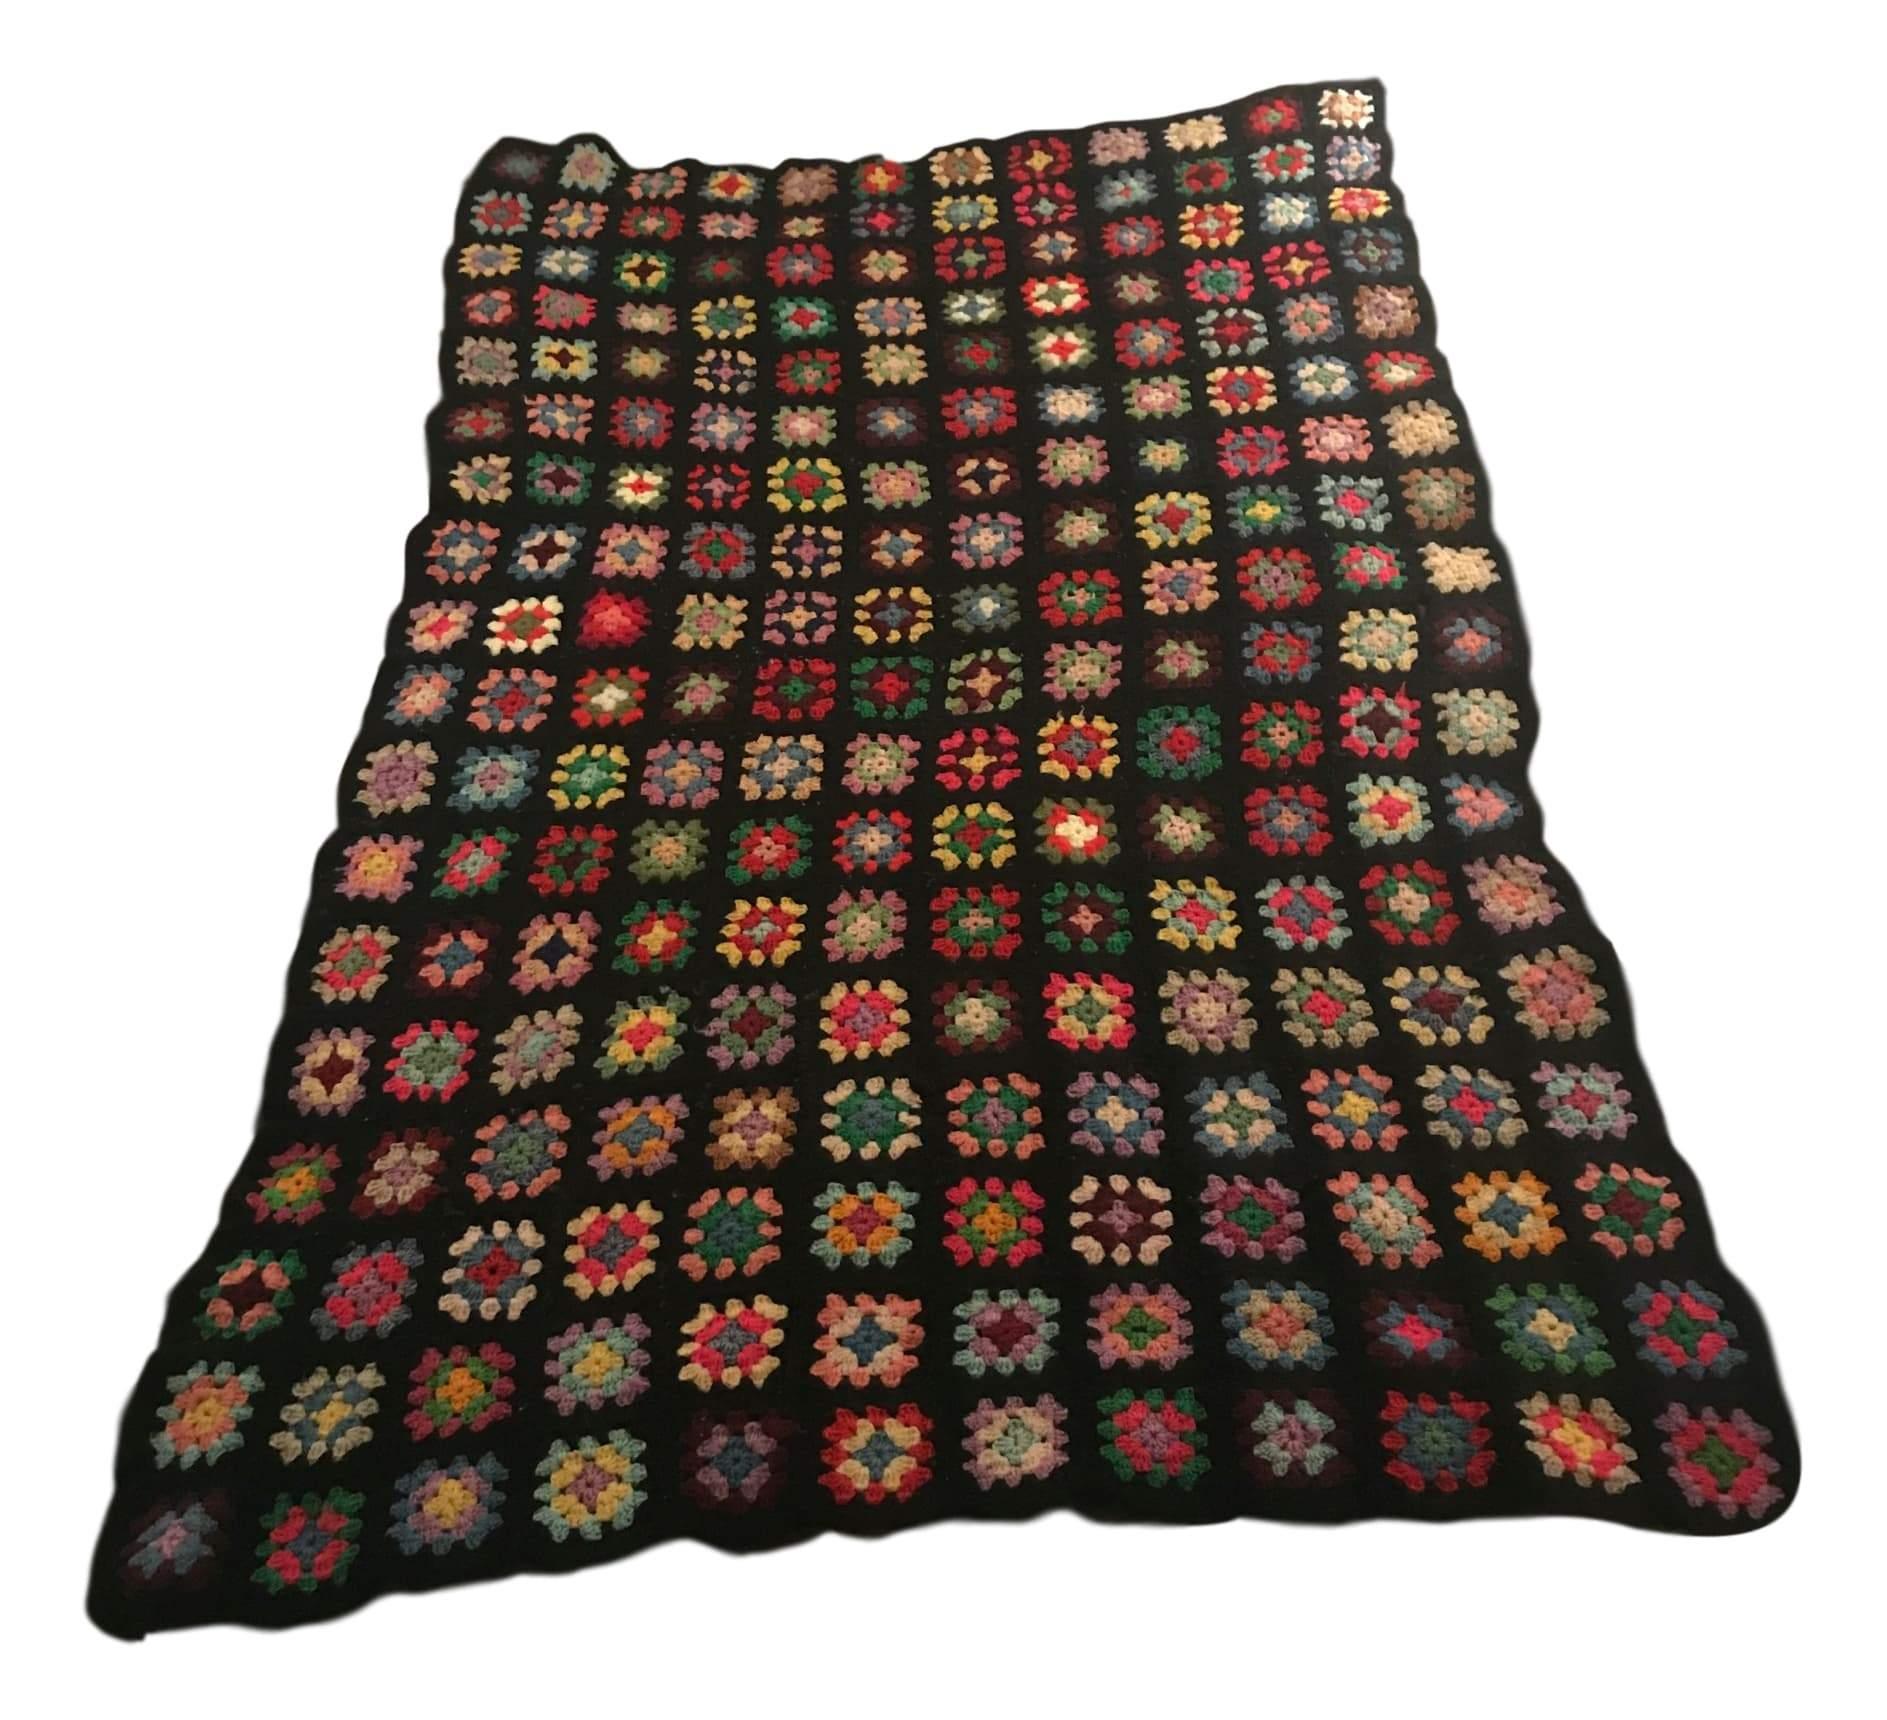 Multicolor Granny Square Blanket   Vintage Blanket   Handmade ...